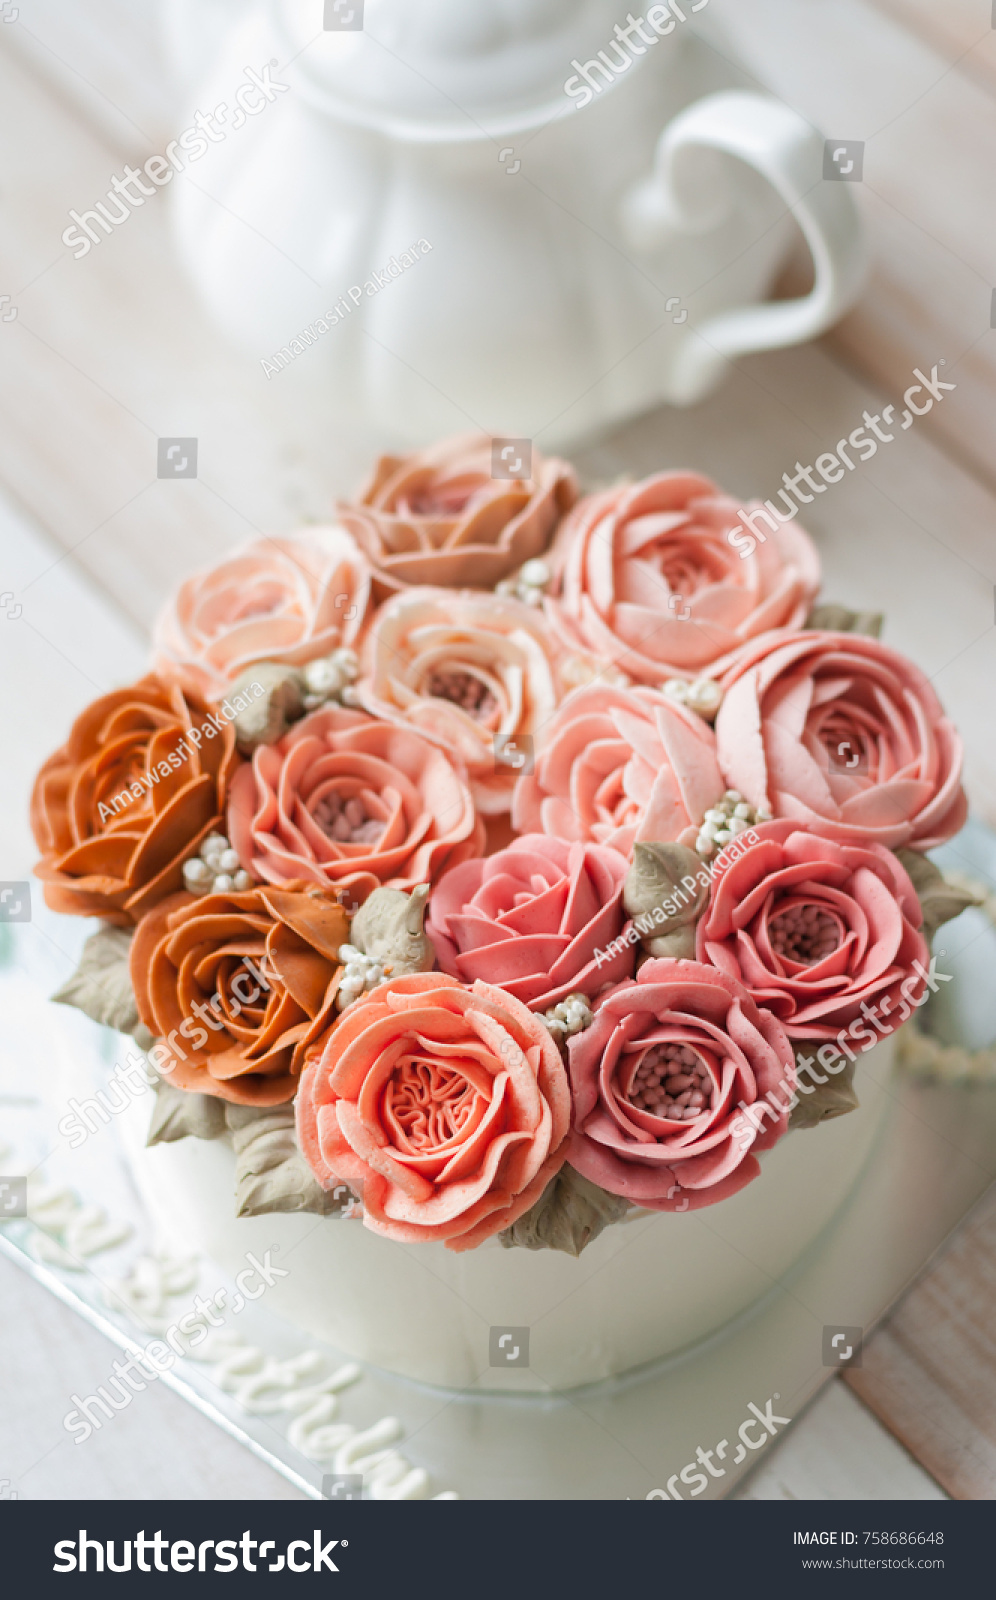 Buttercream Flower Cake Happy Birthday Cake Stock Photo (100% Legal ...